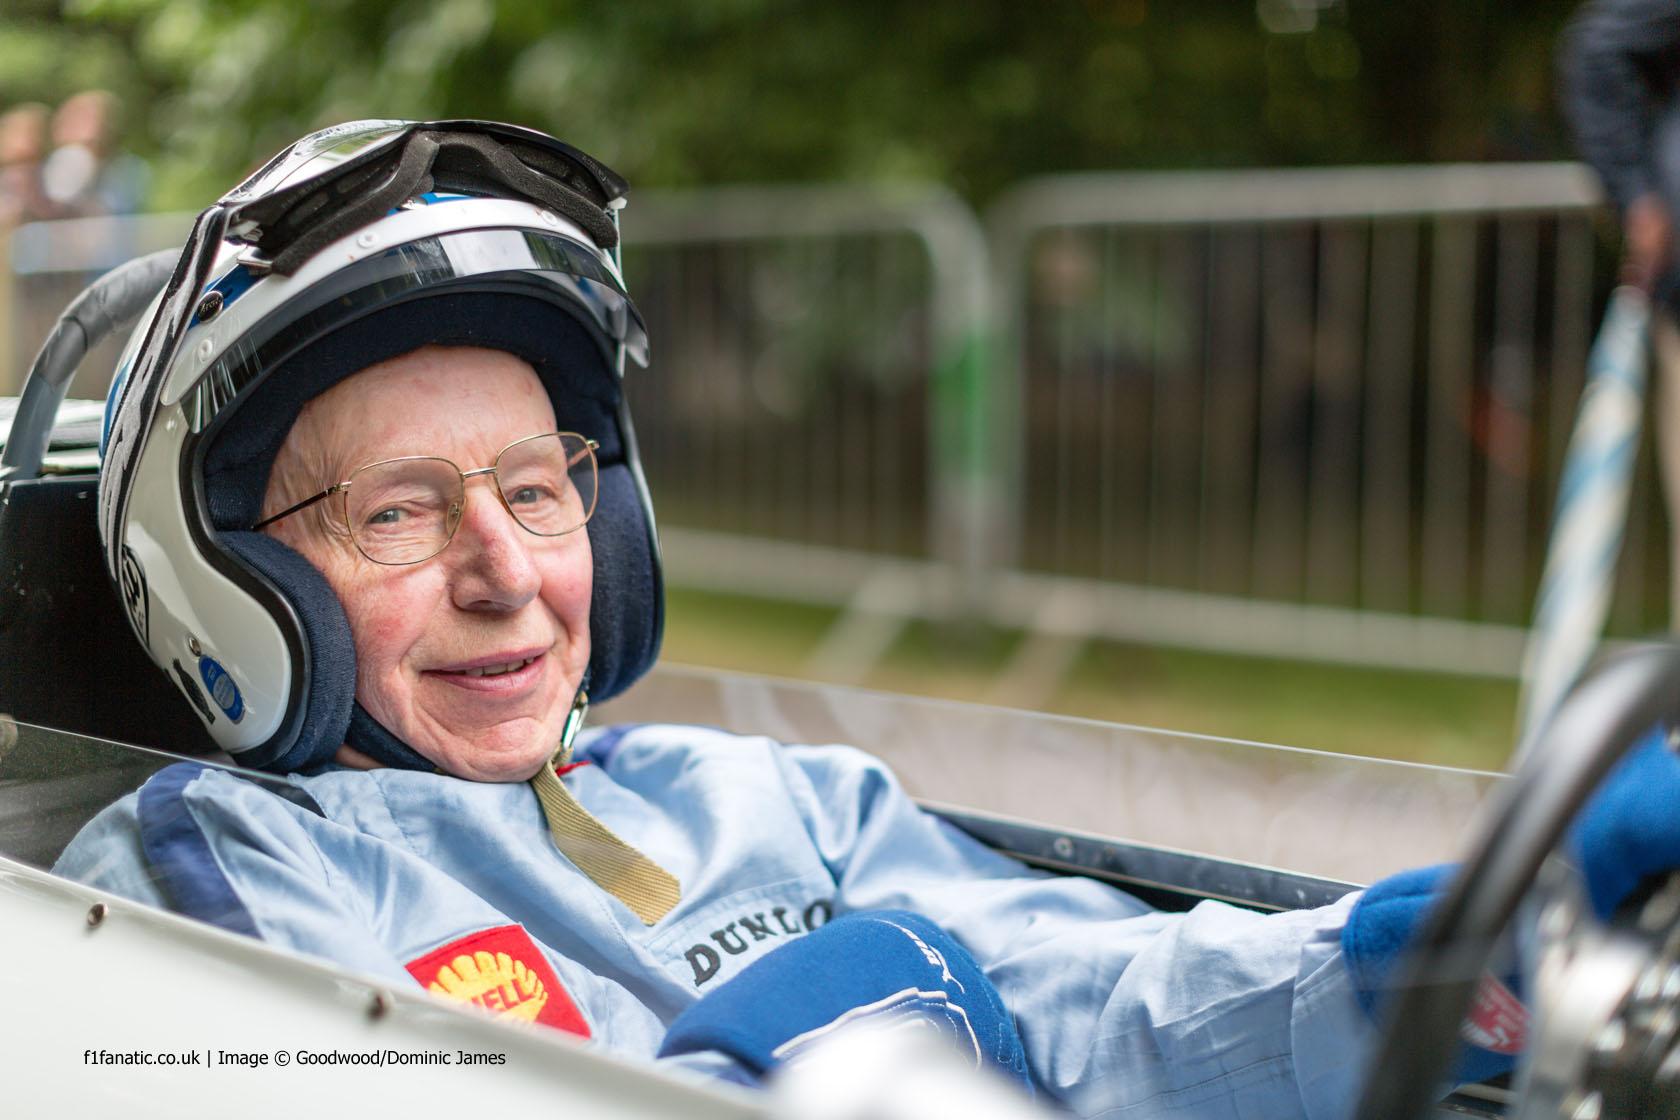 John Surtees, Goodwood Festival of Speed, 2014